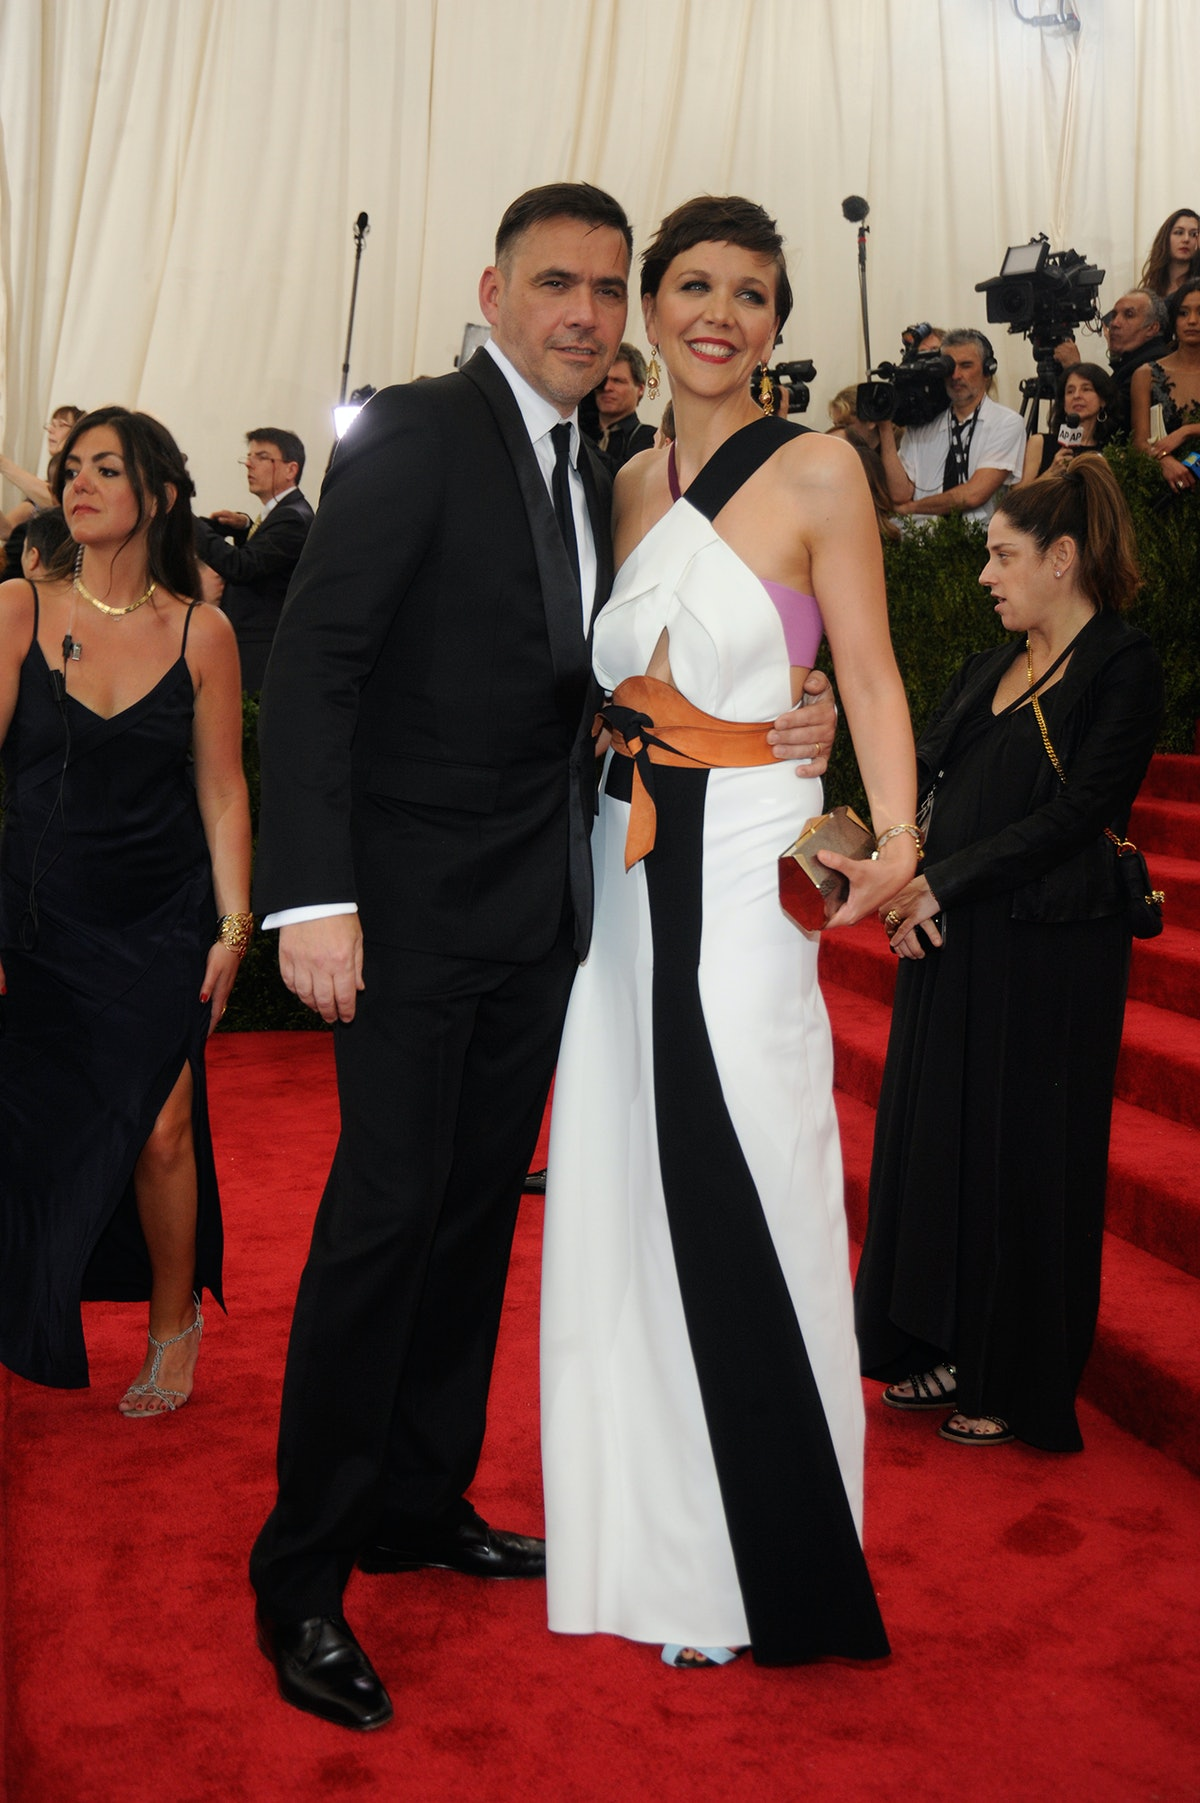 Roland Mouret and Maggie Gyllenhaal